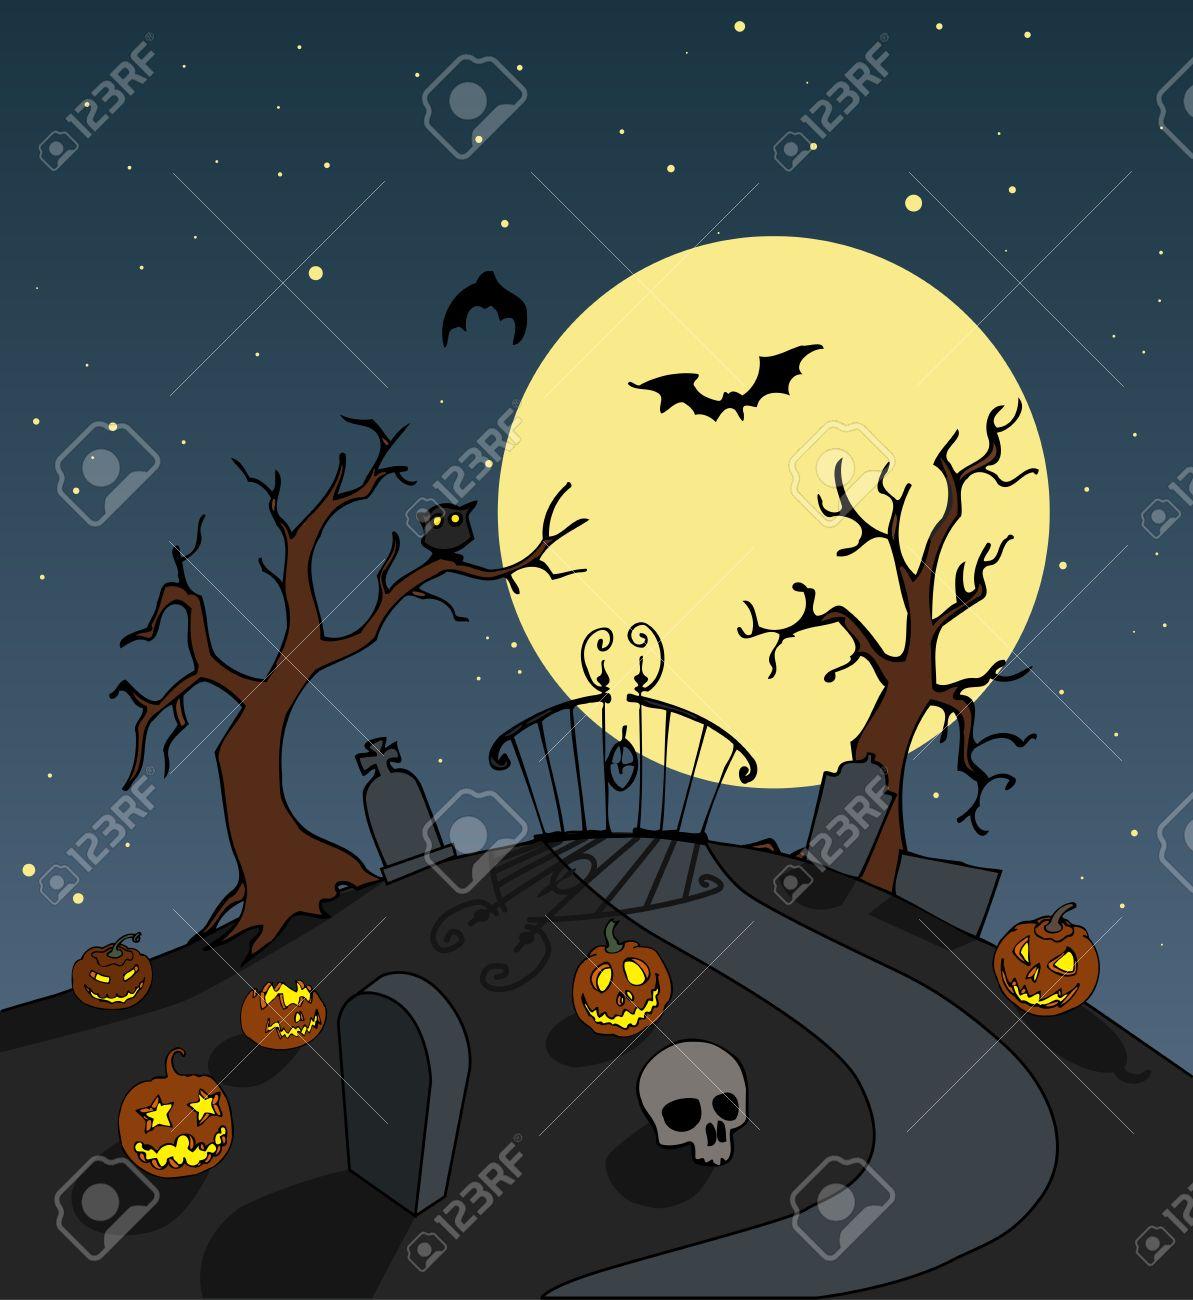 halloween cemetery entrance background. spooky full moon night